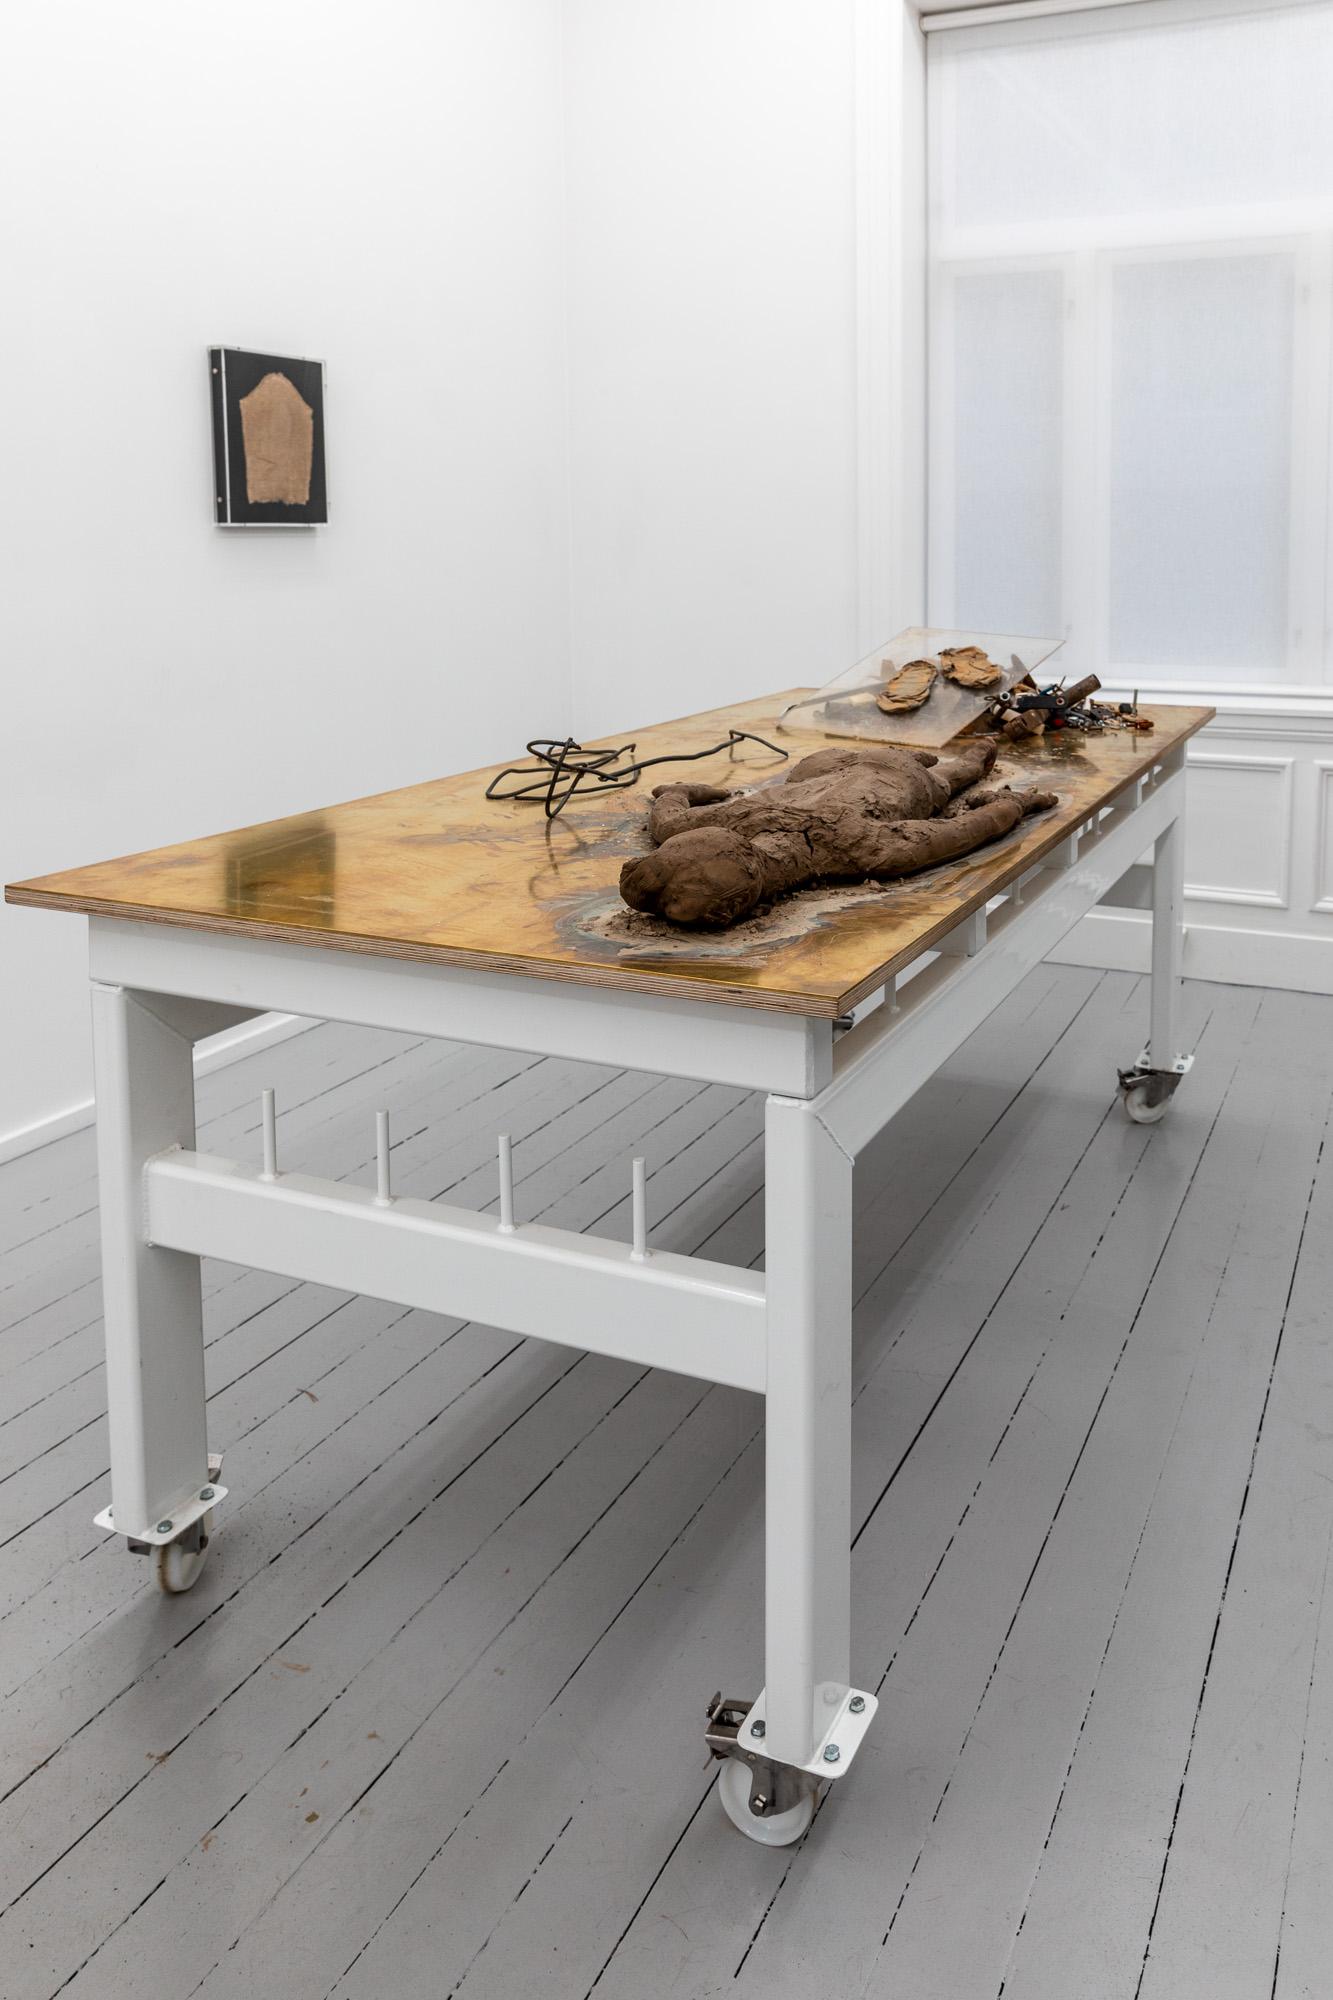 Work Table Roots (Gyökerek), 2020. Mixed media (textile, clay, steel, powder-coated steel, brass, plywood, wheels) on artist designed table, 90 x 200 x 100 cm (table)